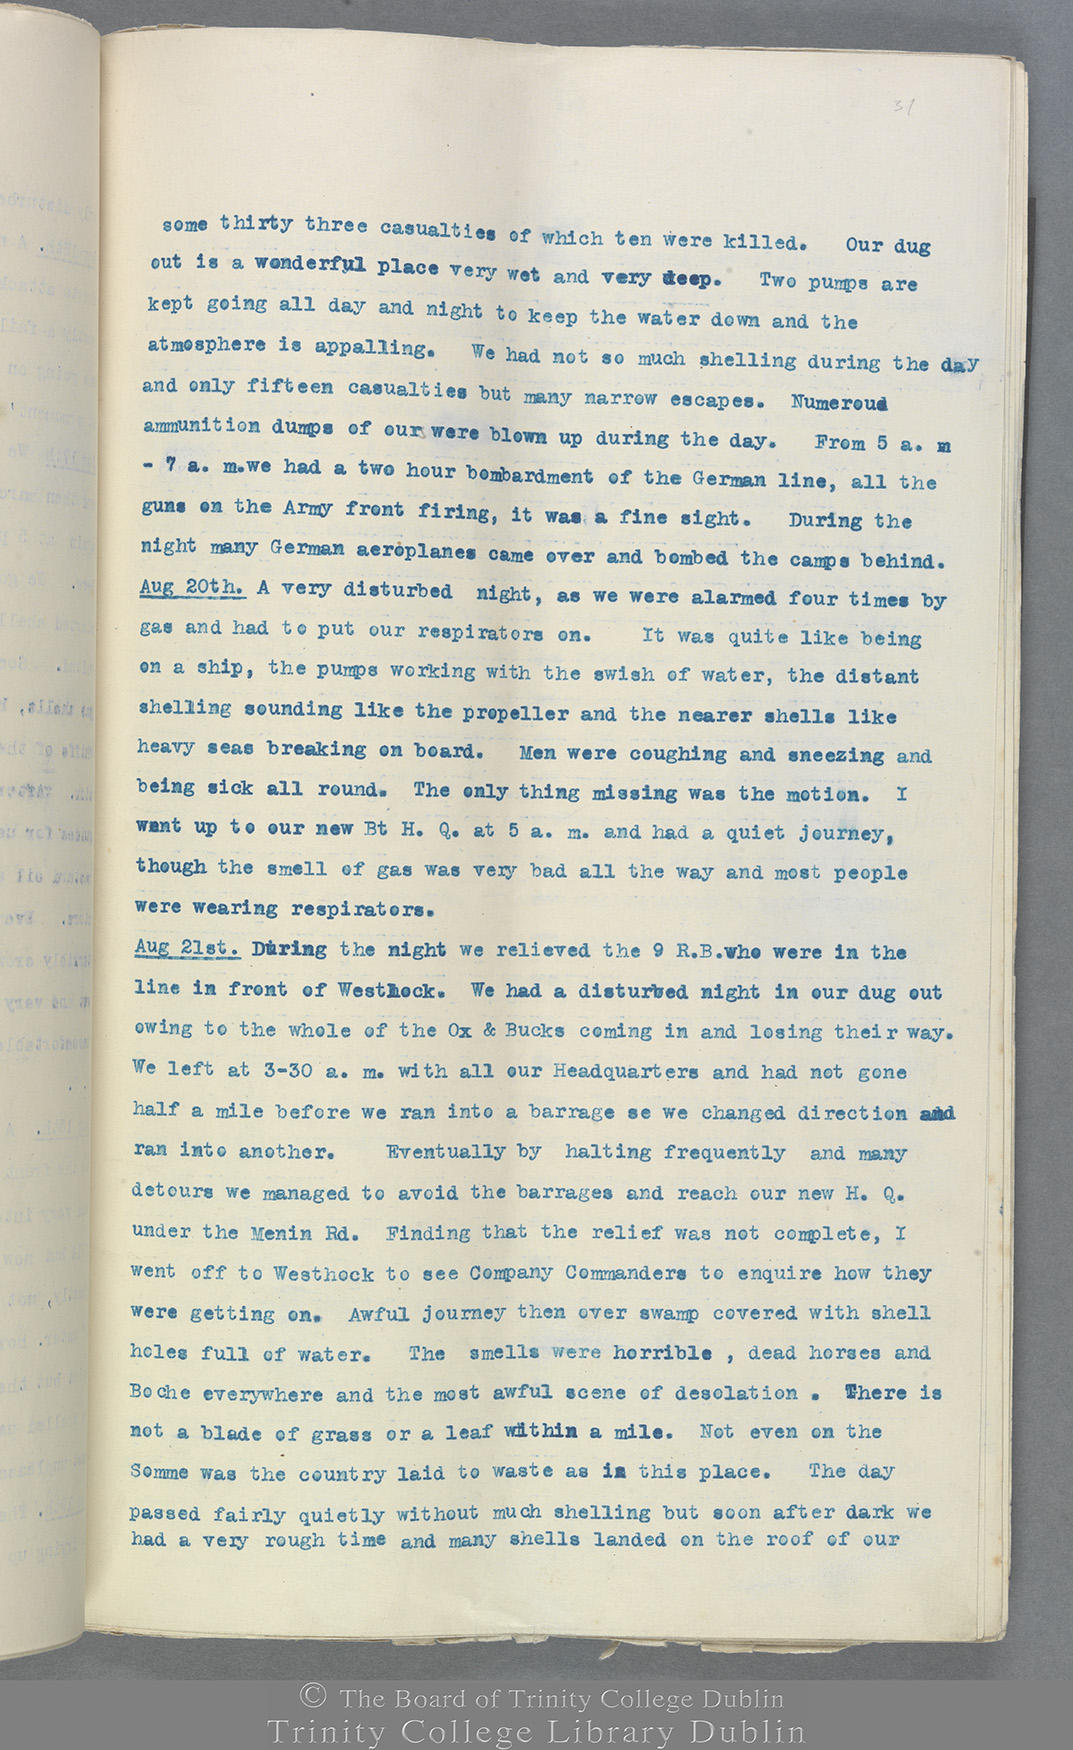 TCD MS 10822 folio 31 recto